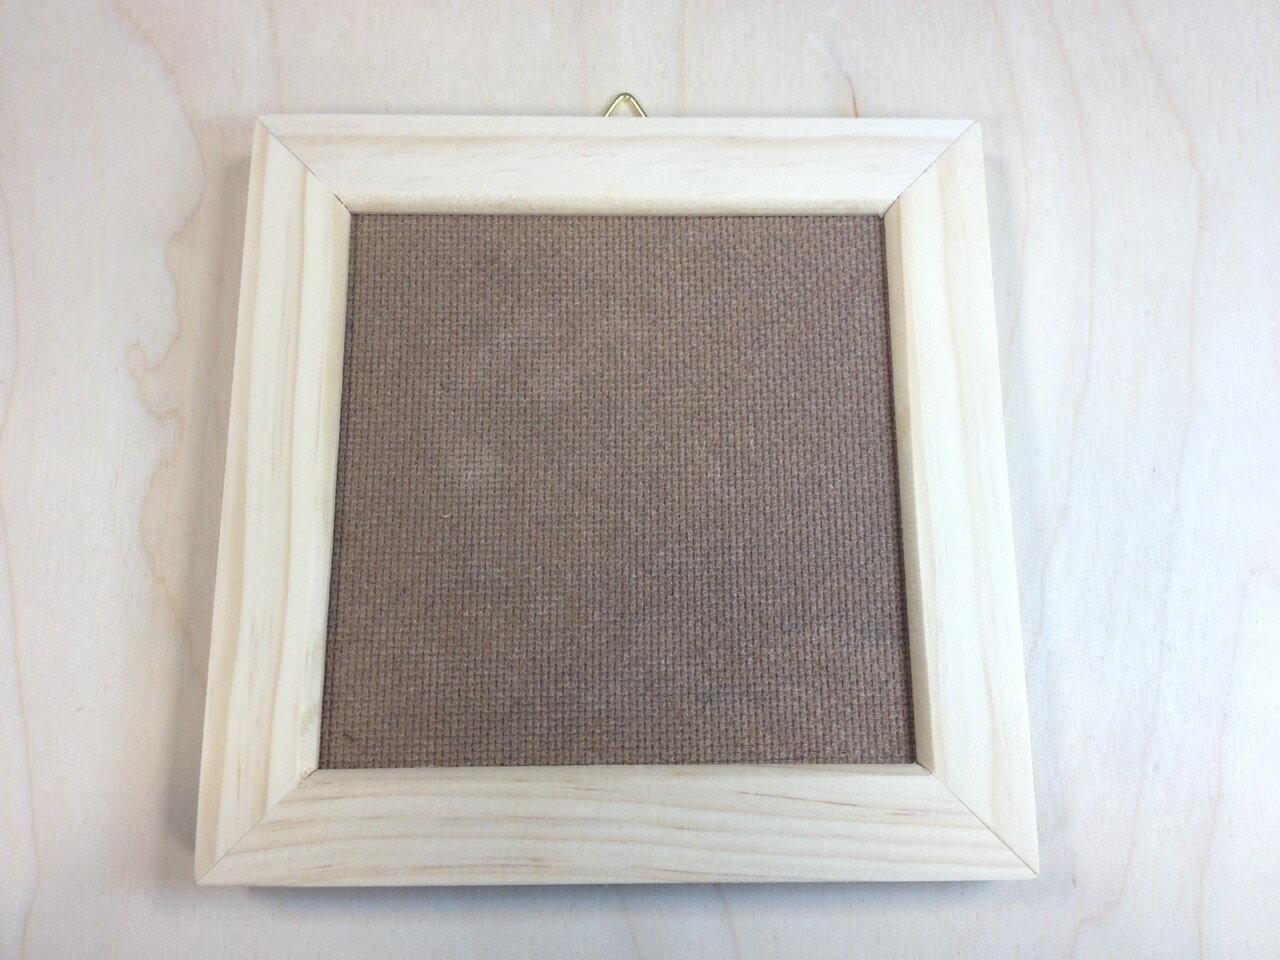 DIY手作材料-15*15cm 原木相框 - 限時優惠好康折扣